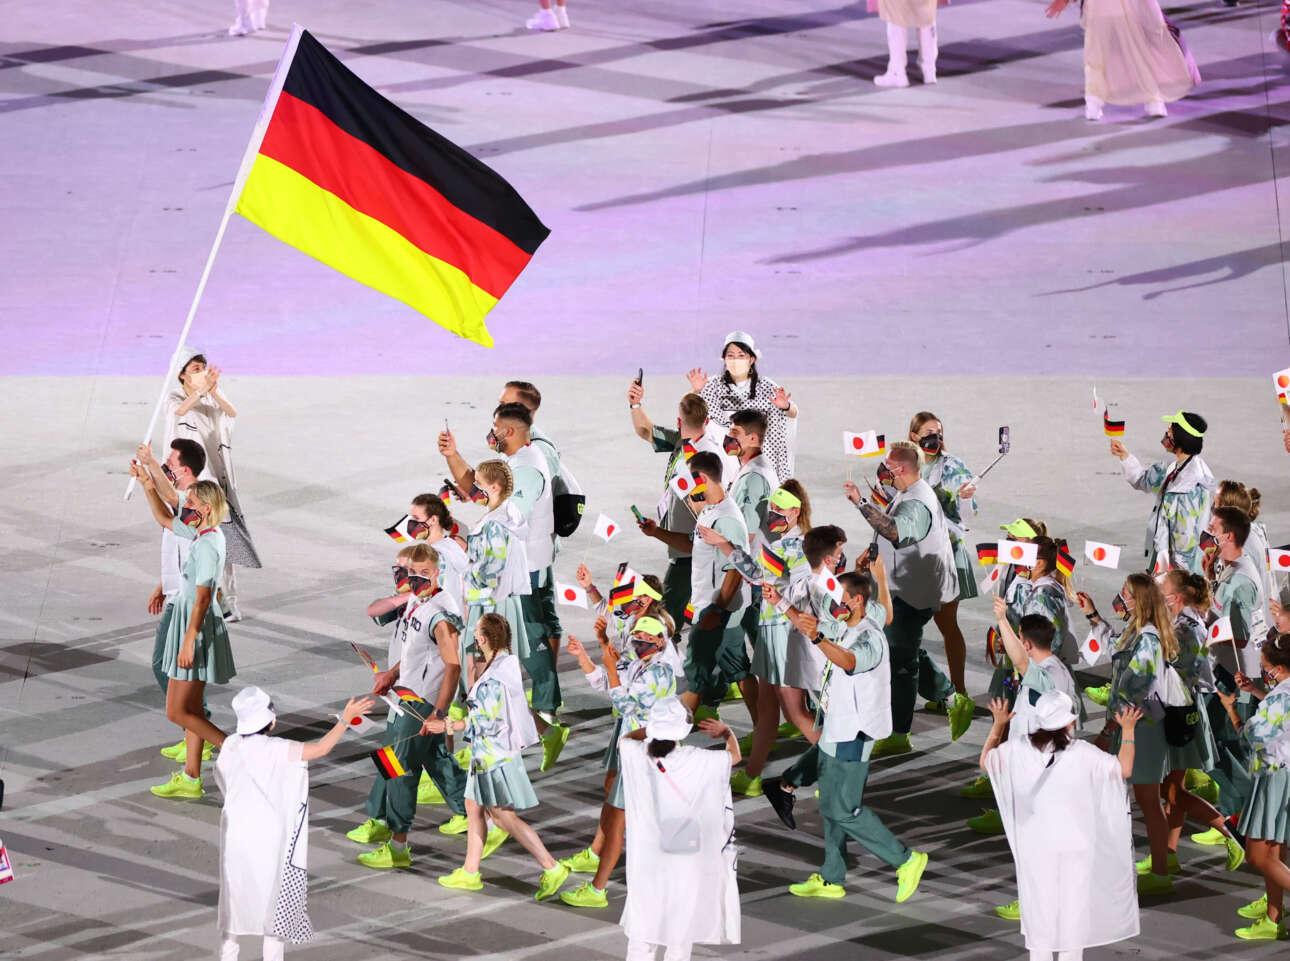 H γερμανική ομάδα με σημαιοφόρους τη Λάουρα Λούντβιχ, αθλήτρια του μπιτς βόλεϊ, και τον δύτη Πάτρικ Χάουσντινγκ